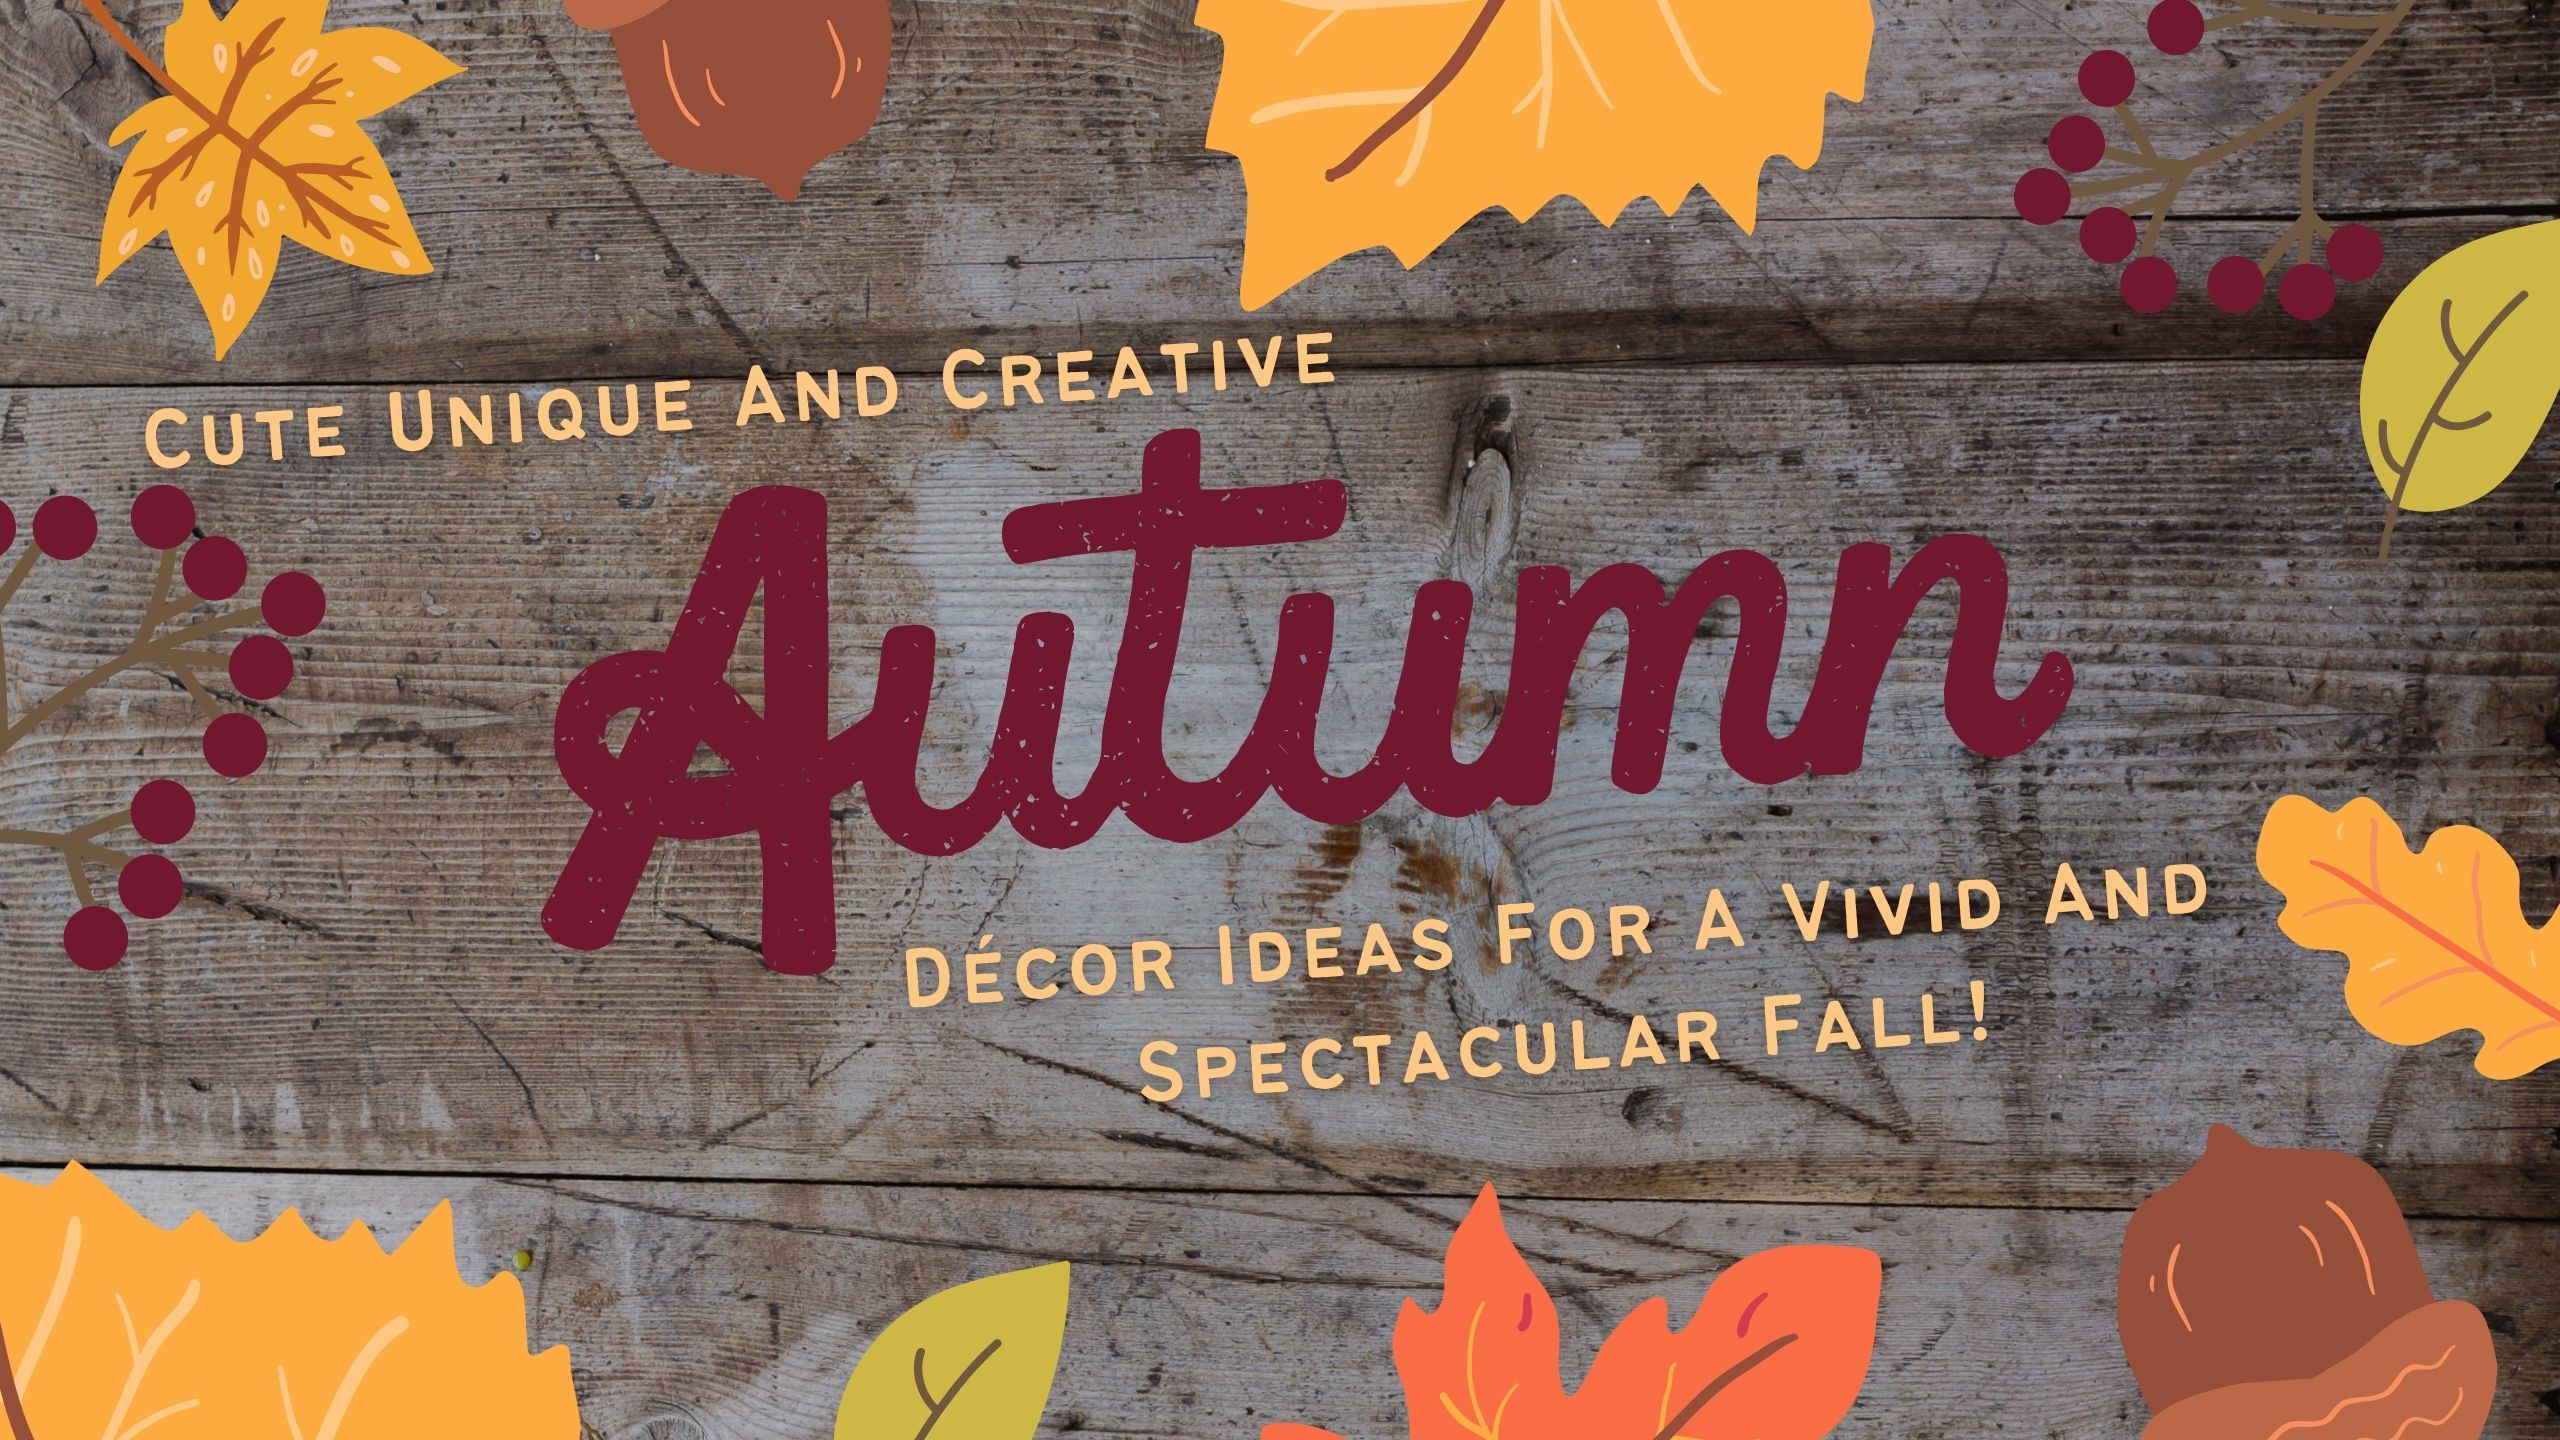 Cute Unique And Creative Autumn Décor Ideas Header